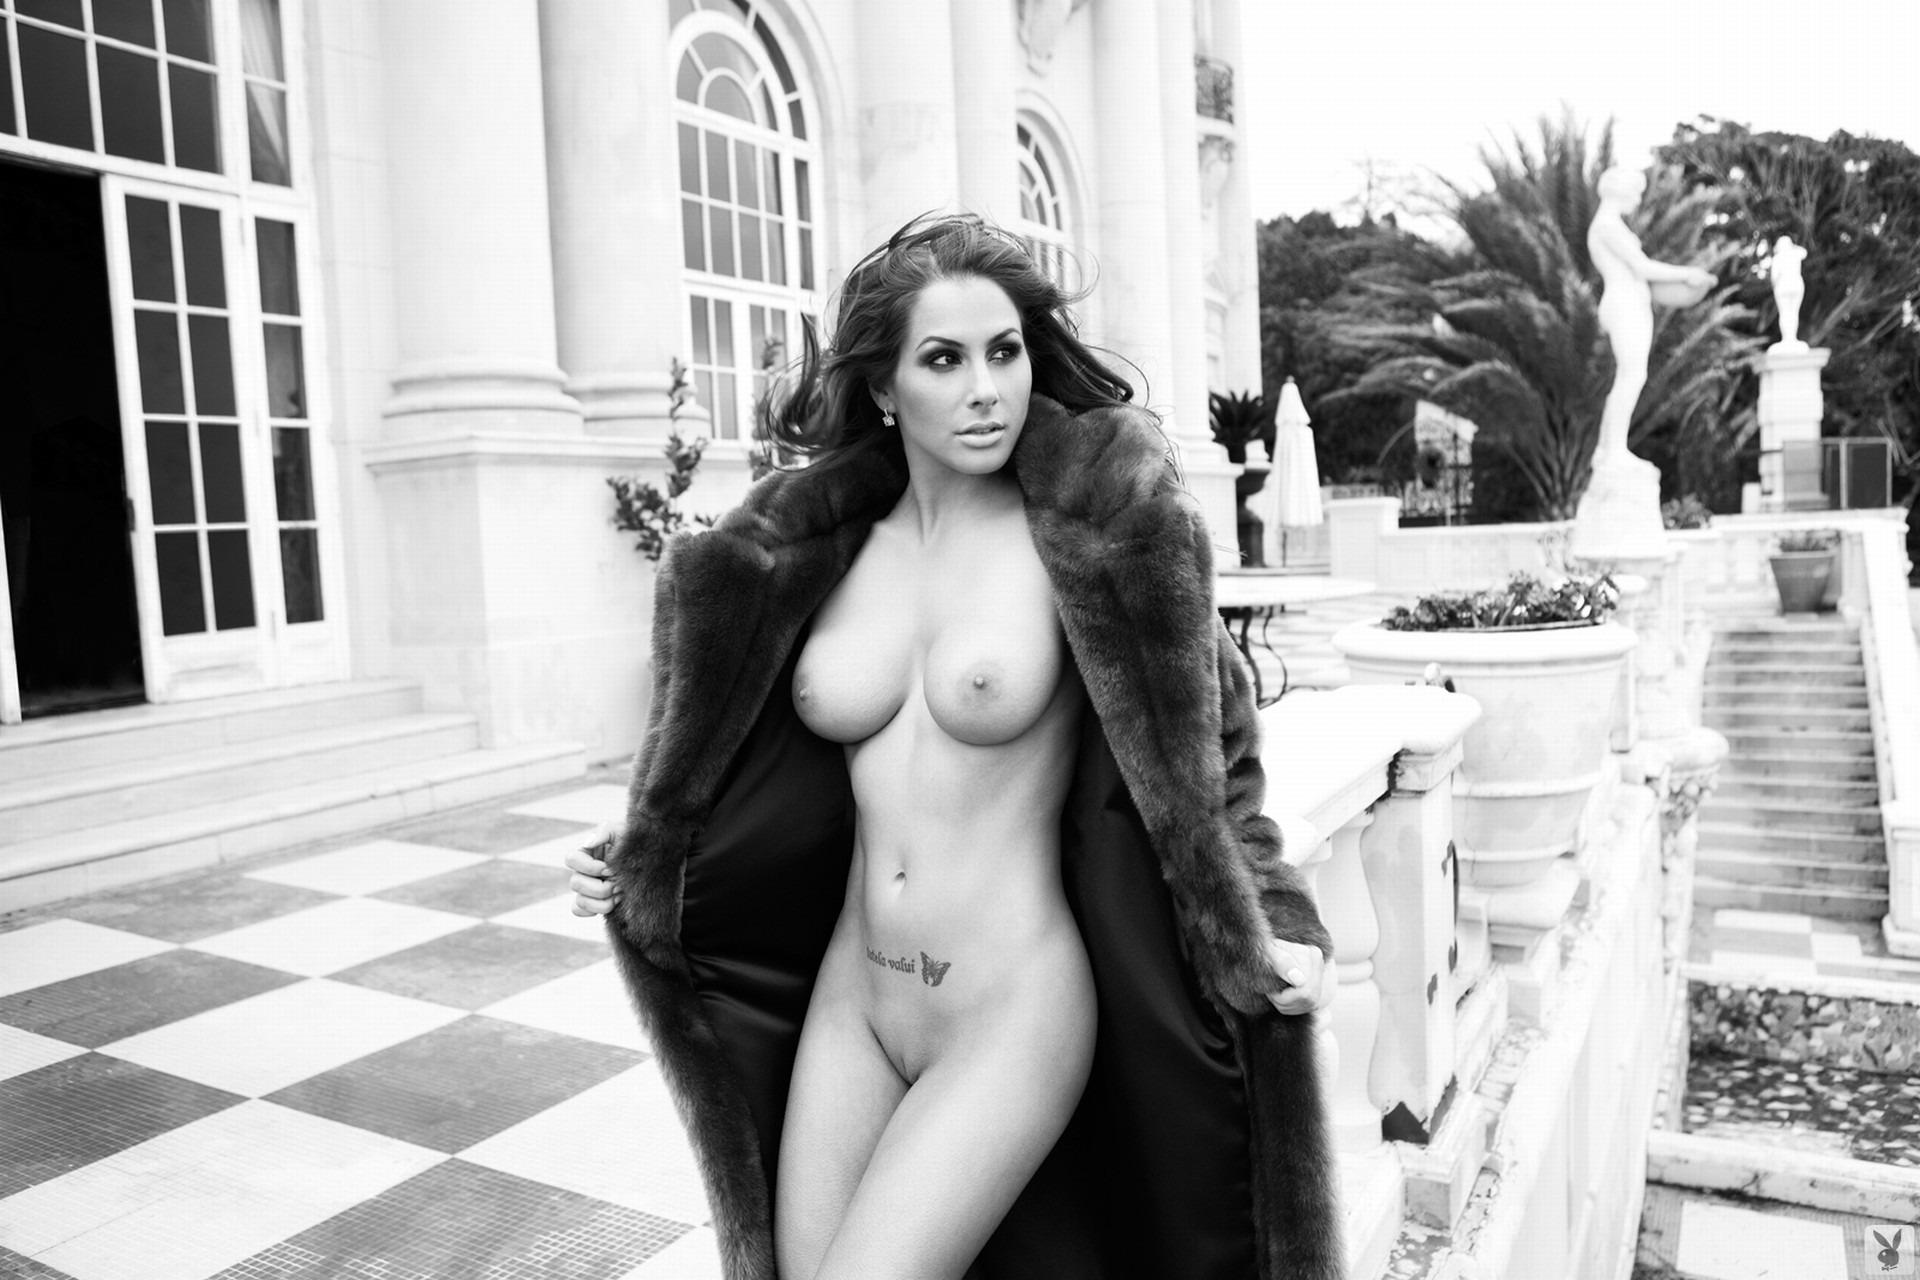 ashley-dupre-nude-photos-star-wars-hot-sex